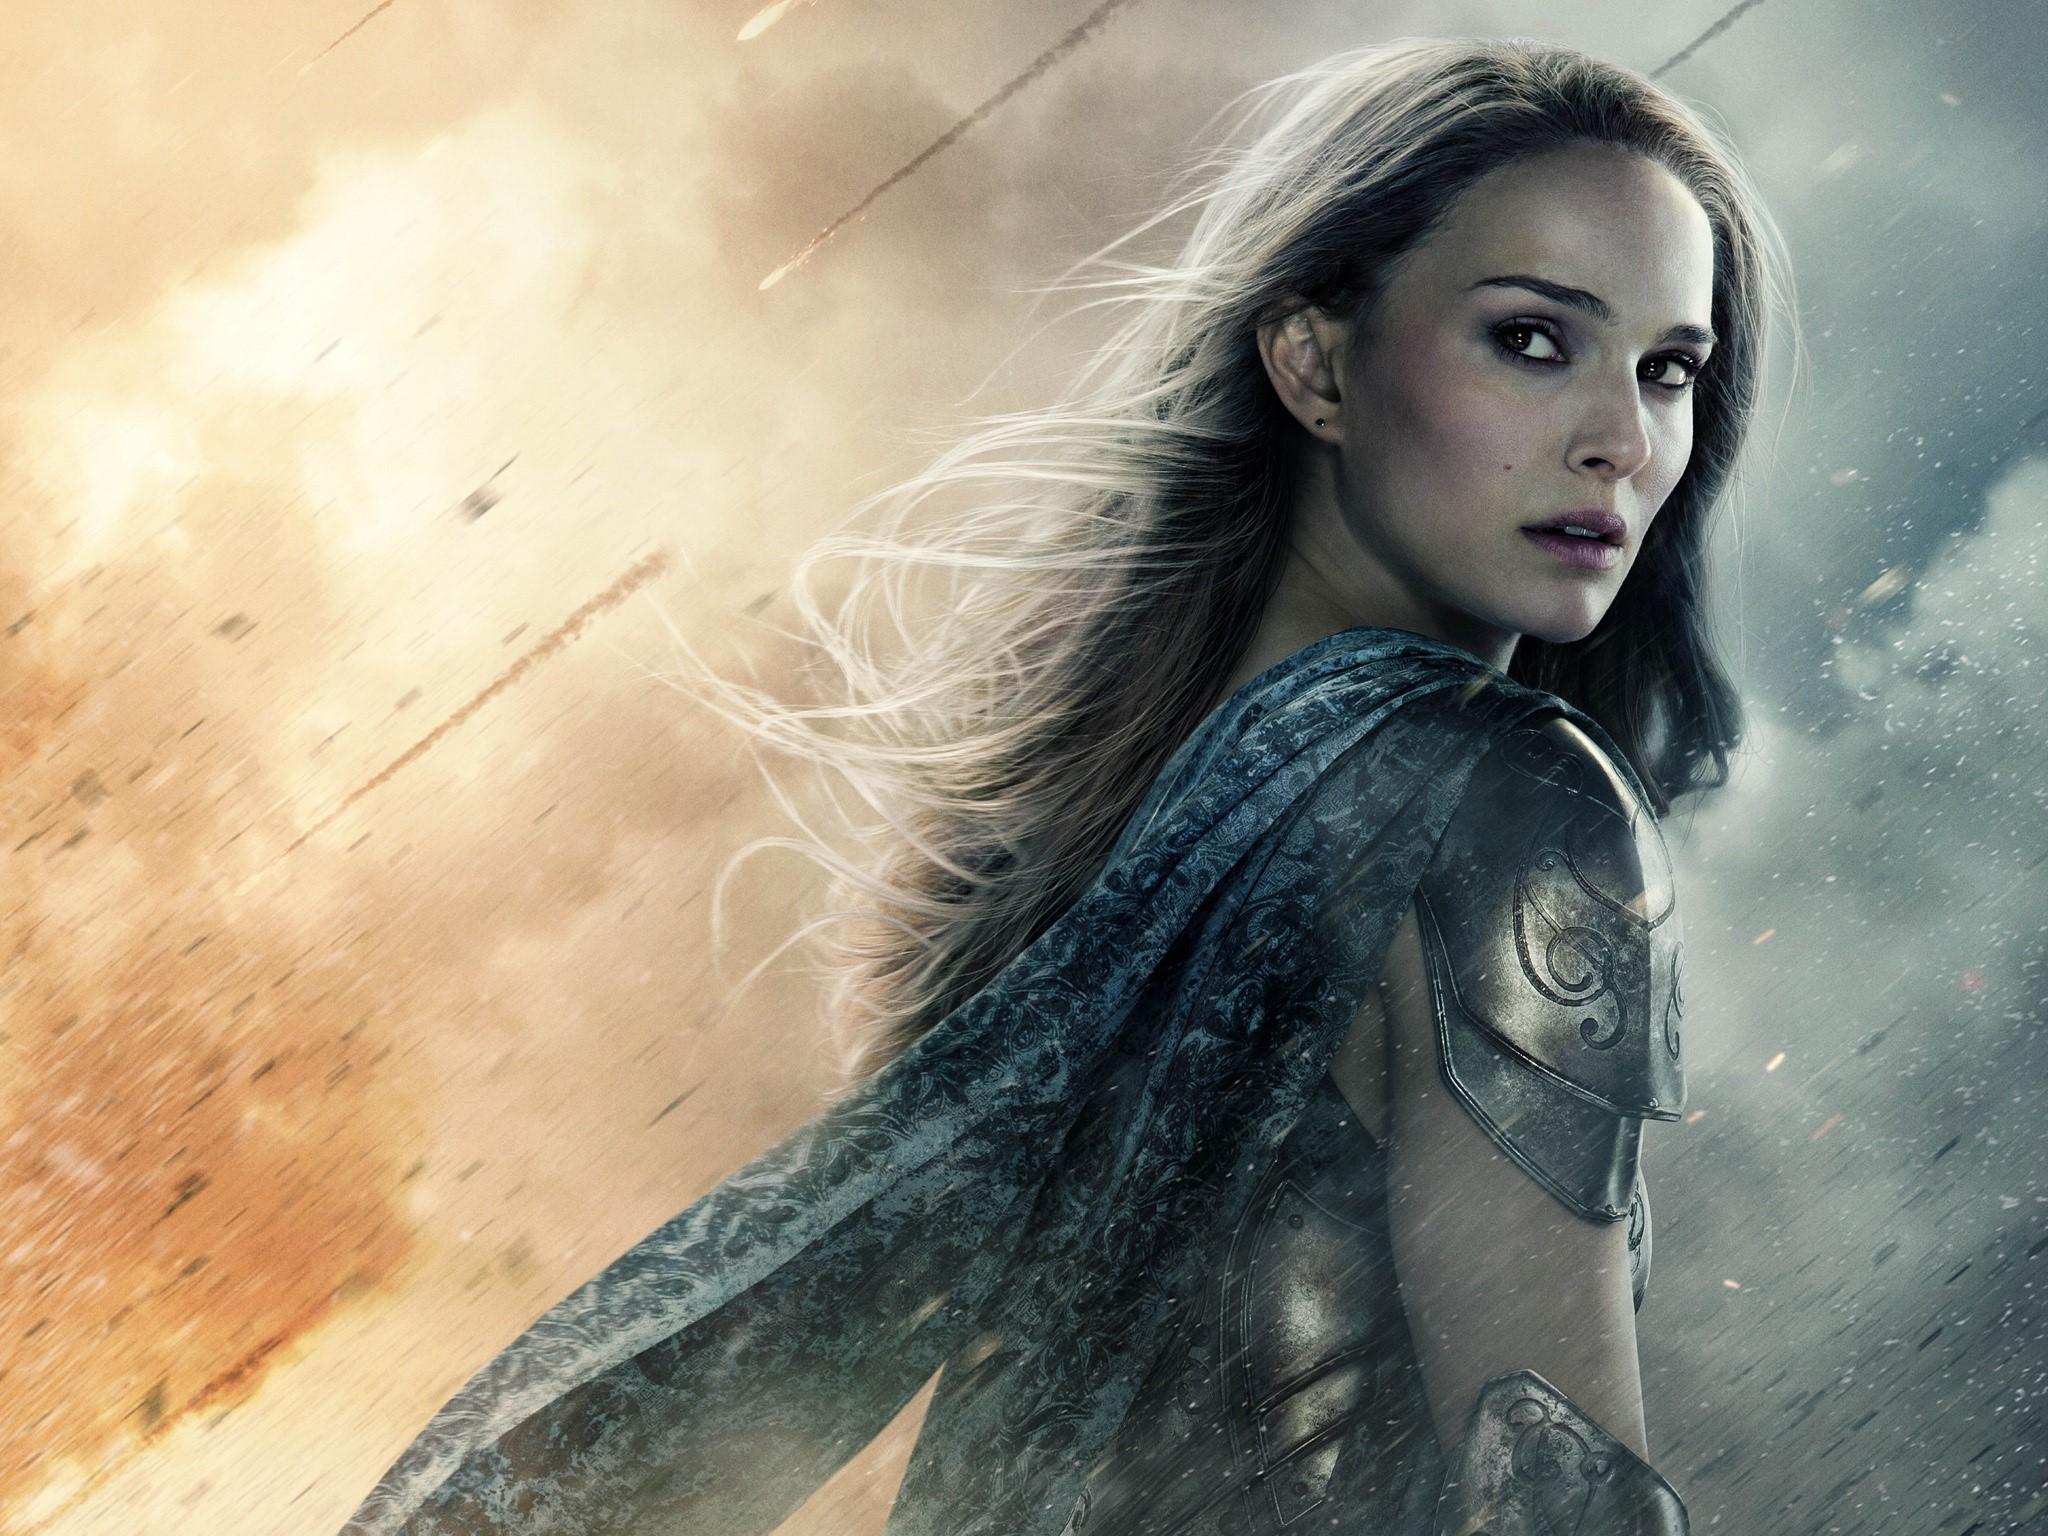 Wallpaper Natalie Portman in Thor 2